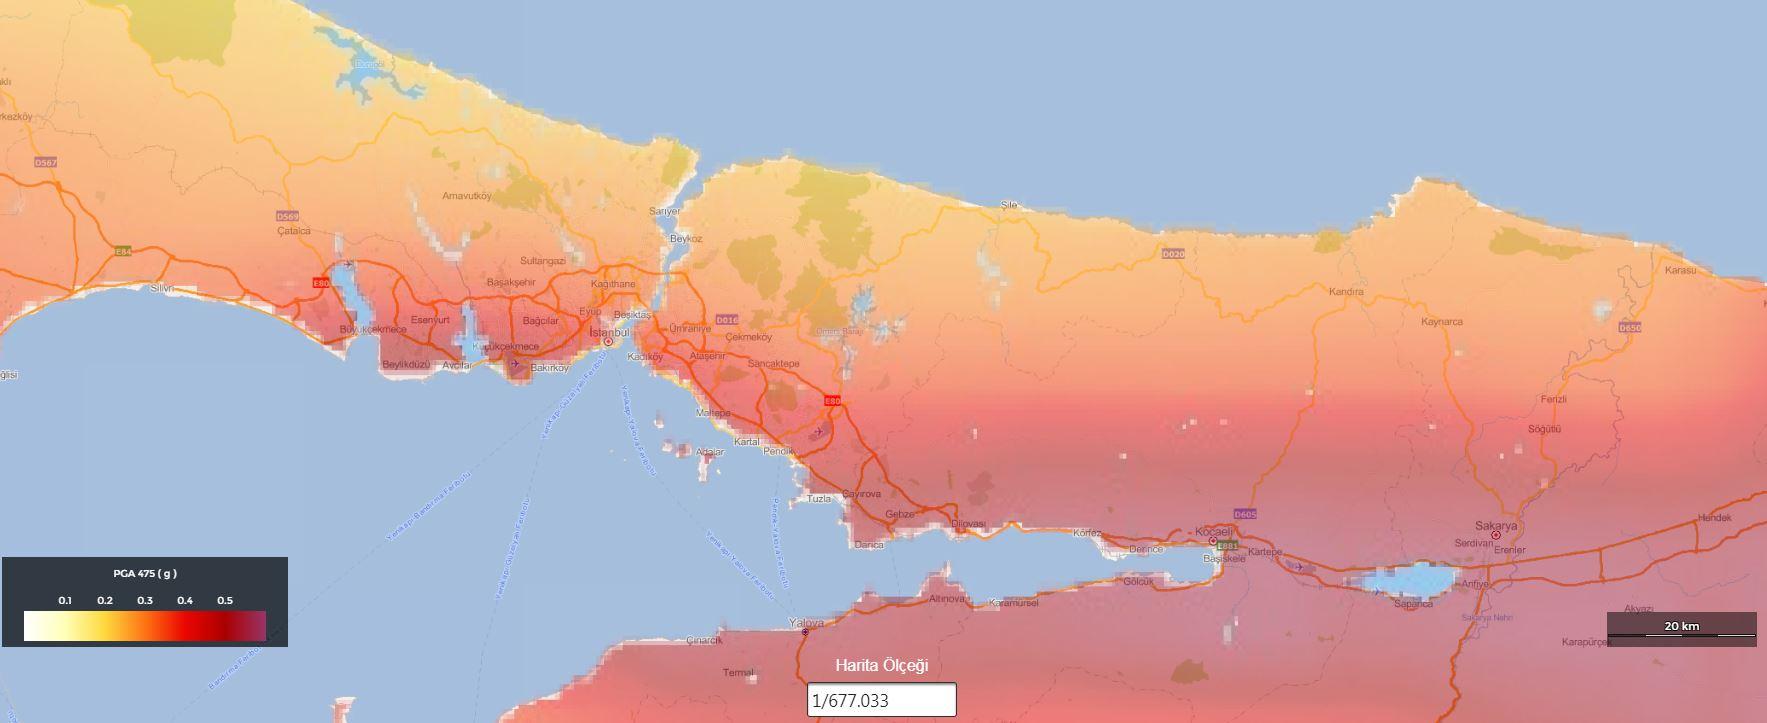 Istanbul Da Deprem Riski Yuksek Bolgeler Neresi